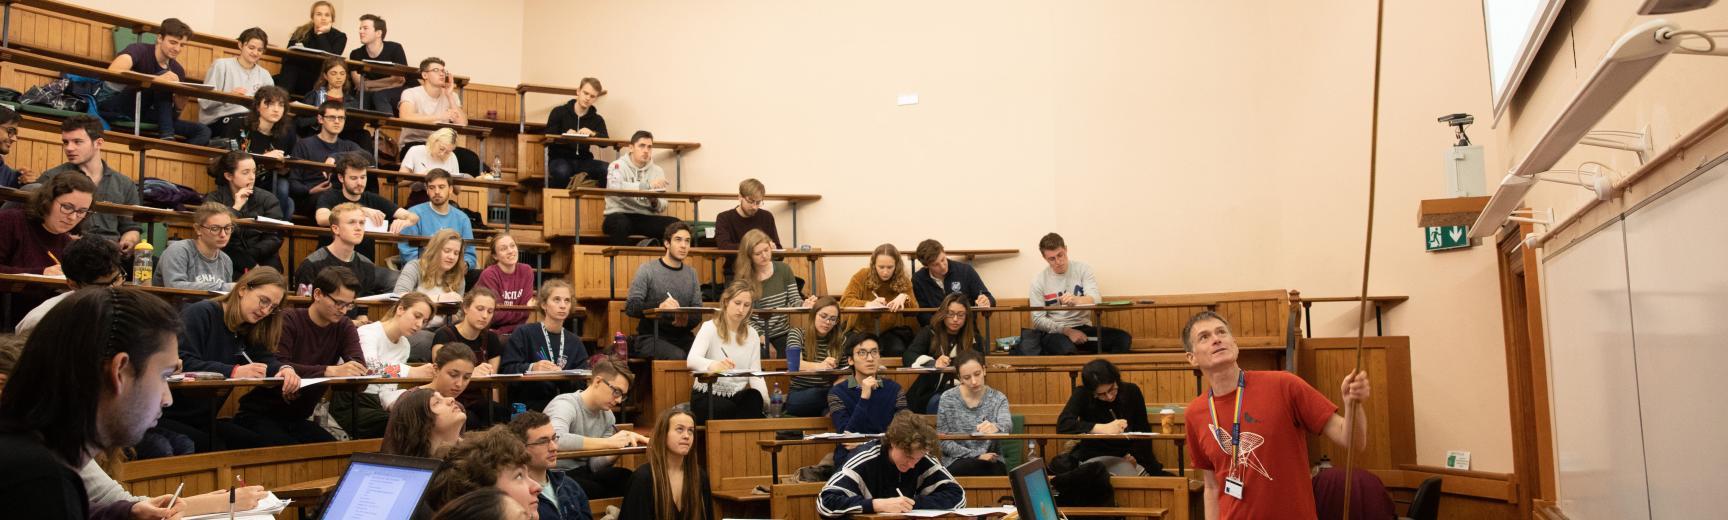 An Undergraduate Lecture